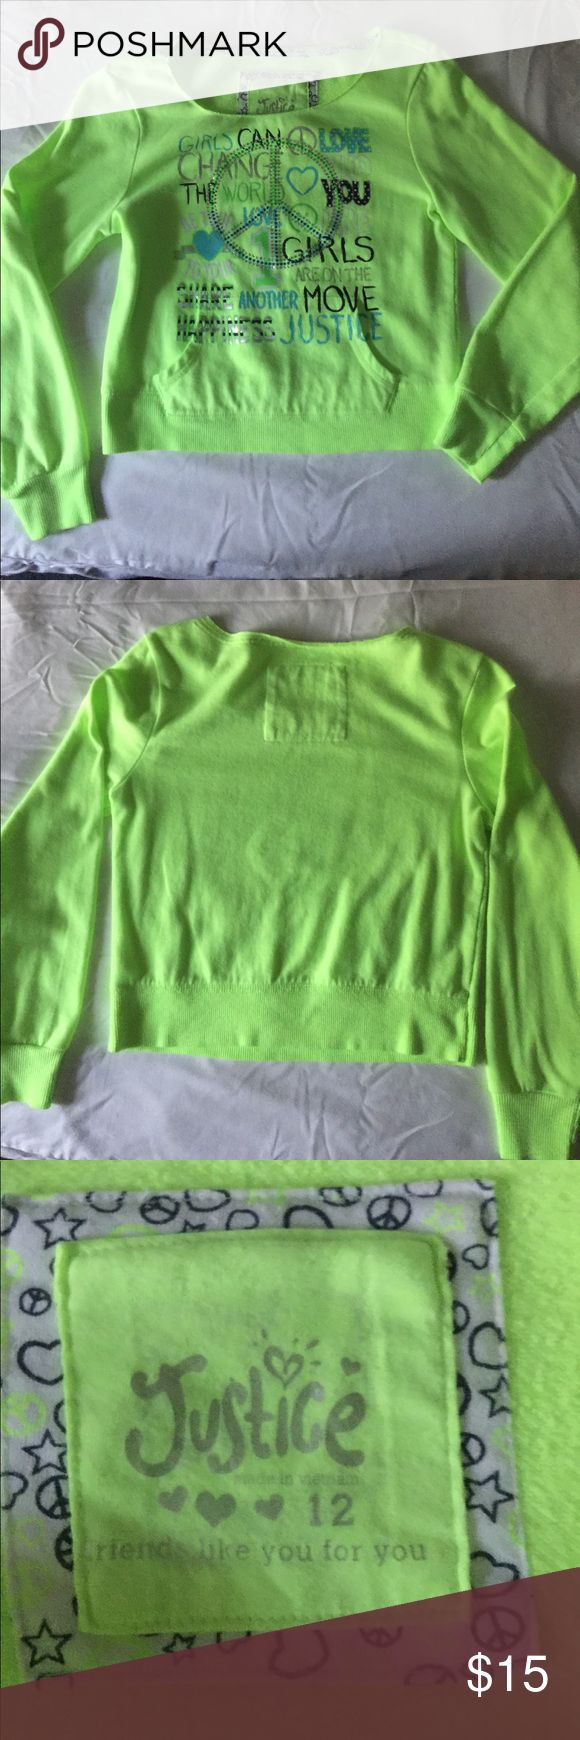 Justice girls top Lime green sweat shirt Justice Shirts & Tops Sweatshirts & Hoodies